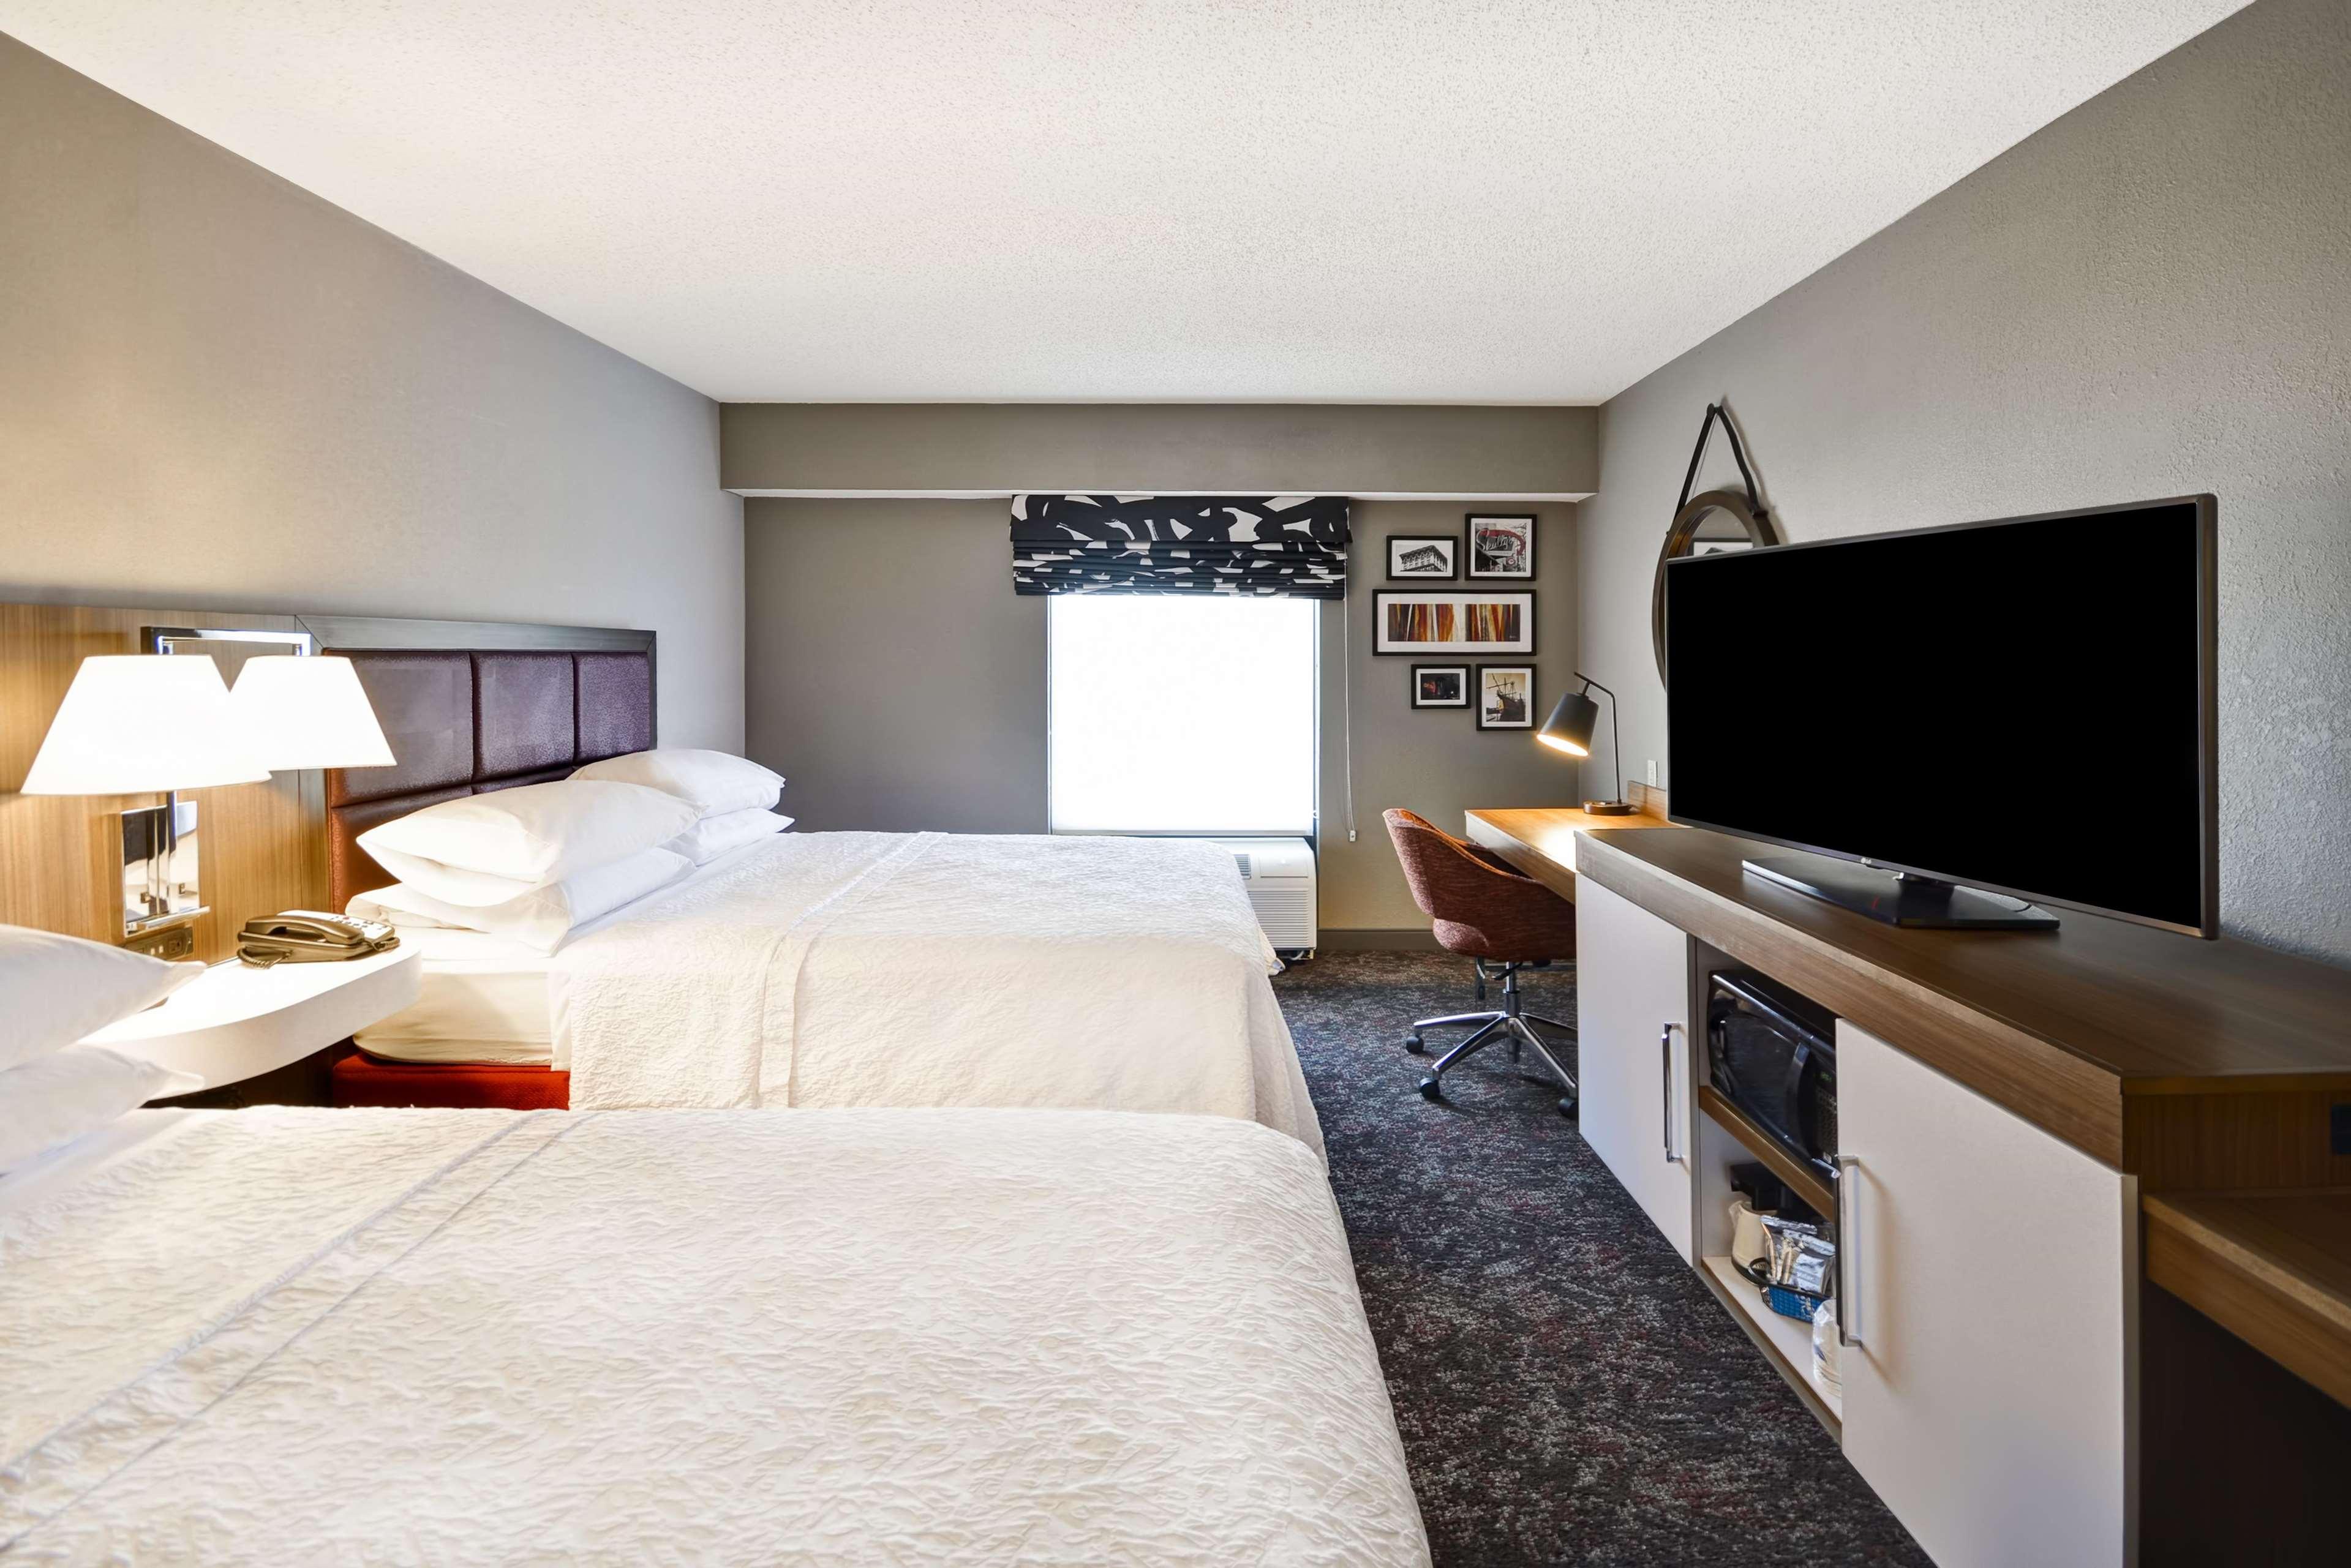 Hampton Inn & Suites Columbus-Easton Area image 46